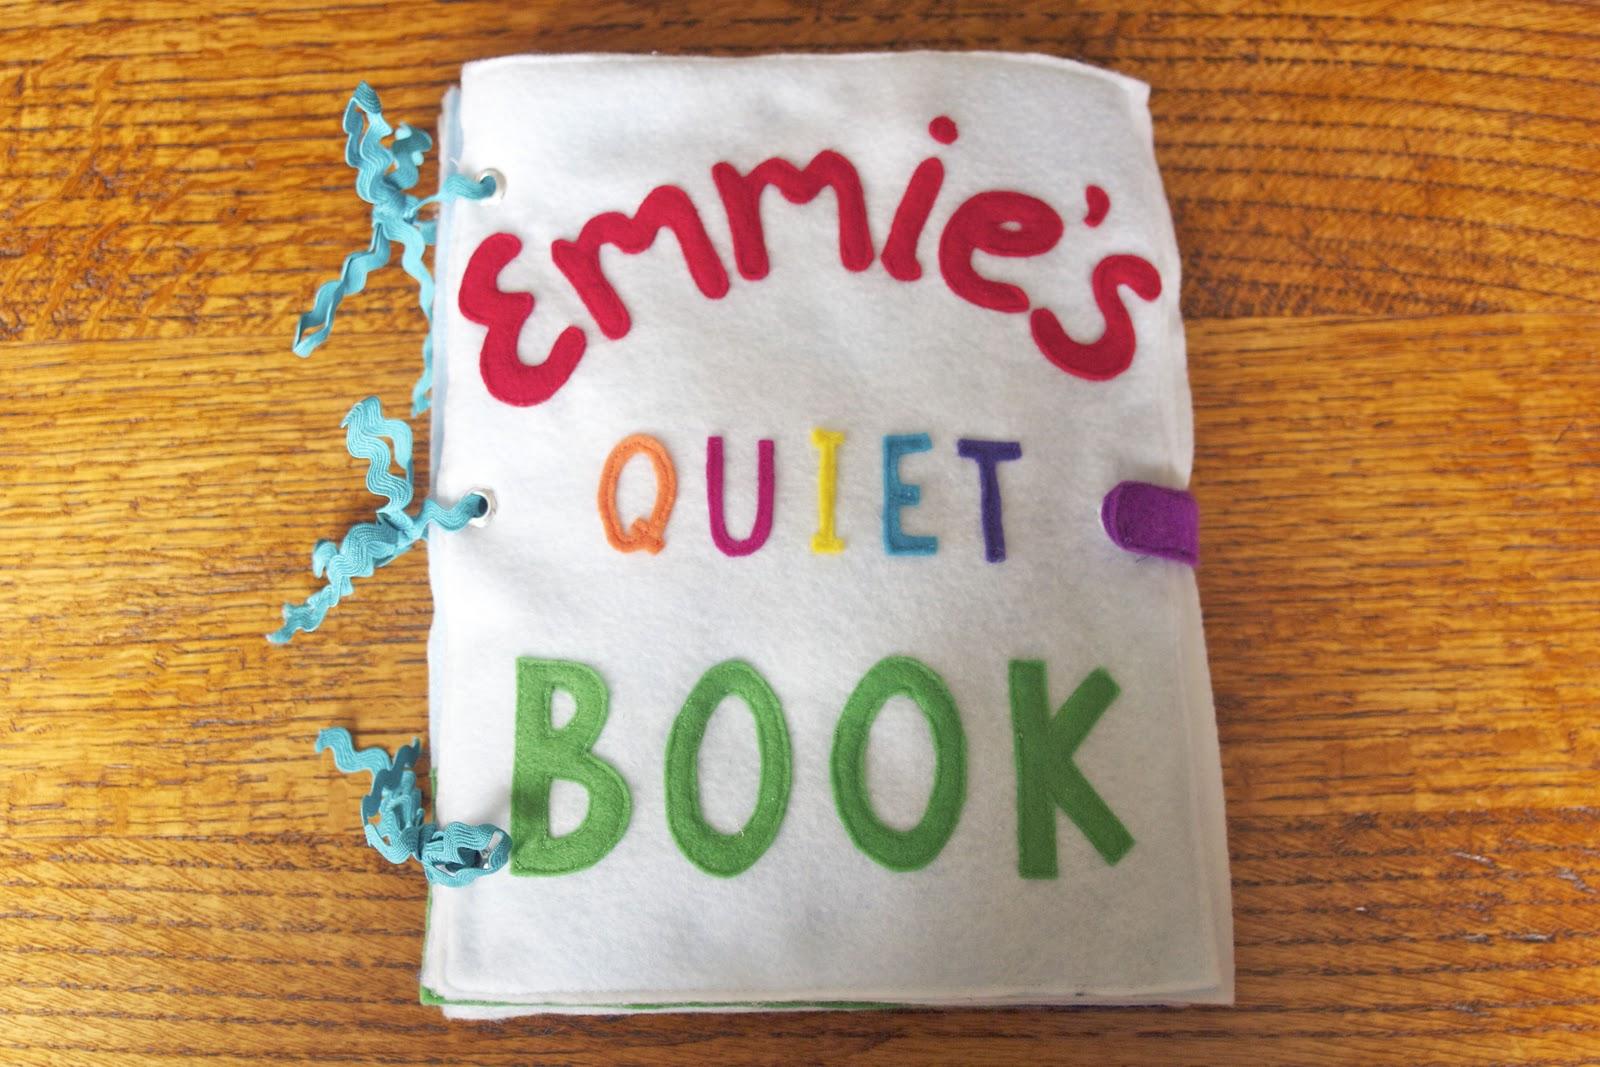 The Quiet Book - Girly Version | shoutingforha